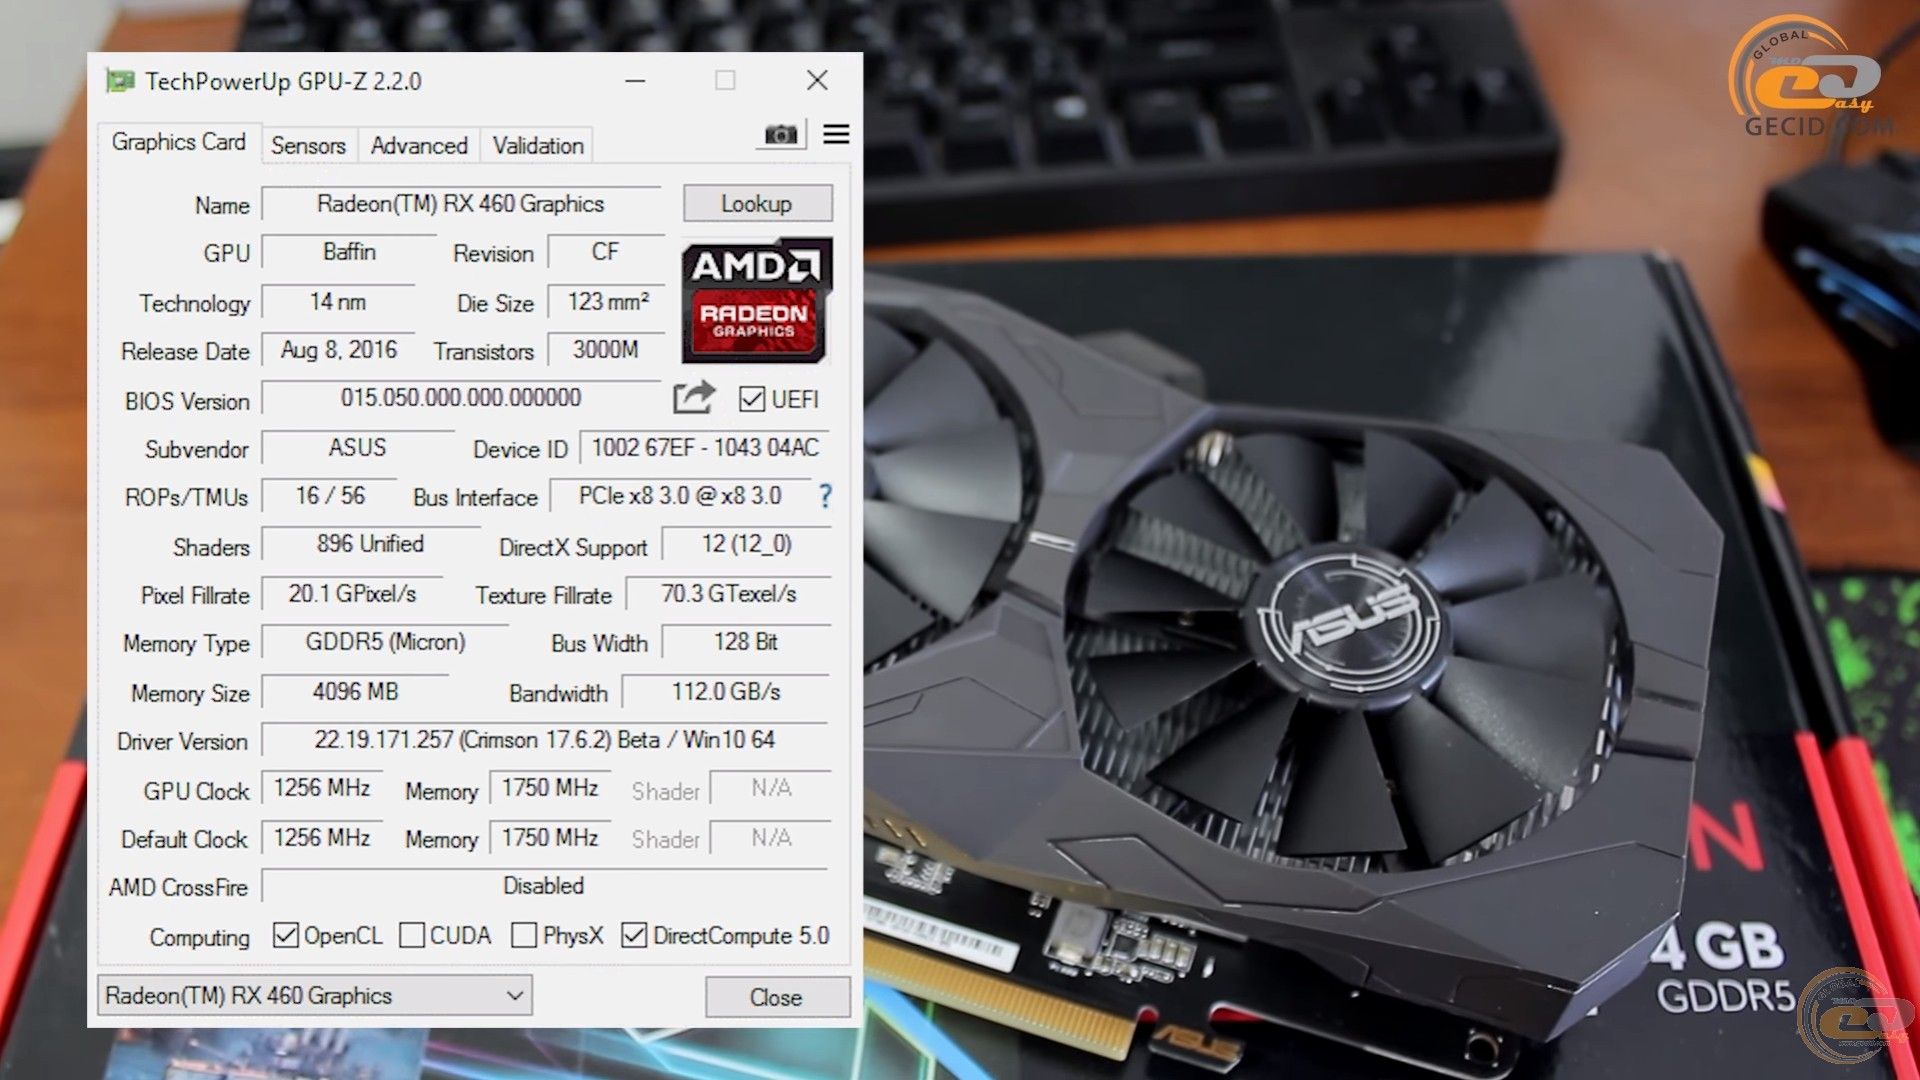 AMD Radeon RX 560 4GB vs GeForce GTX 1050 и Radeon RX 460